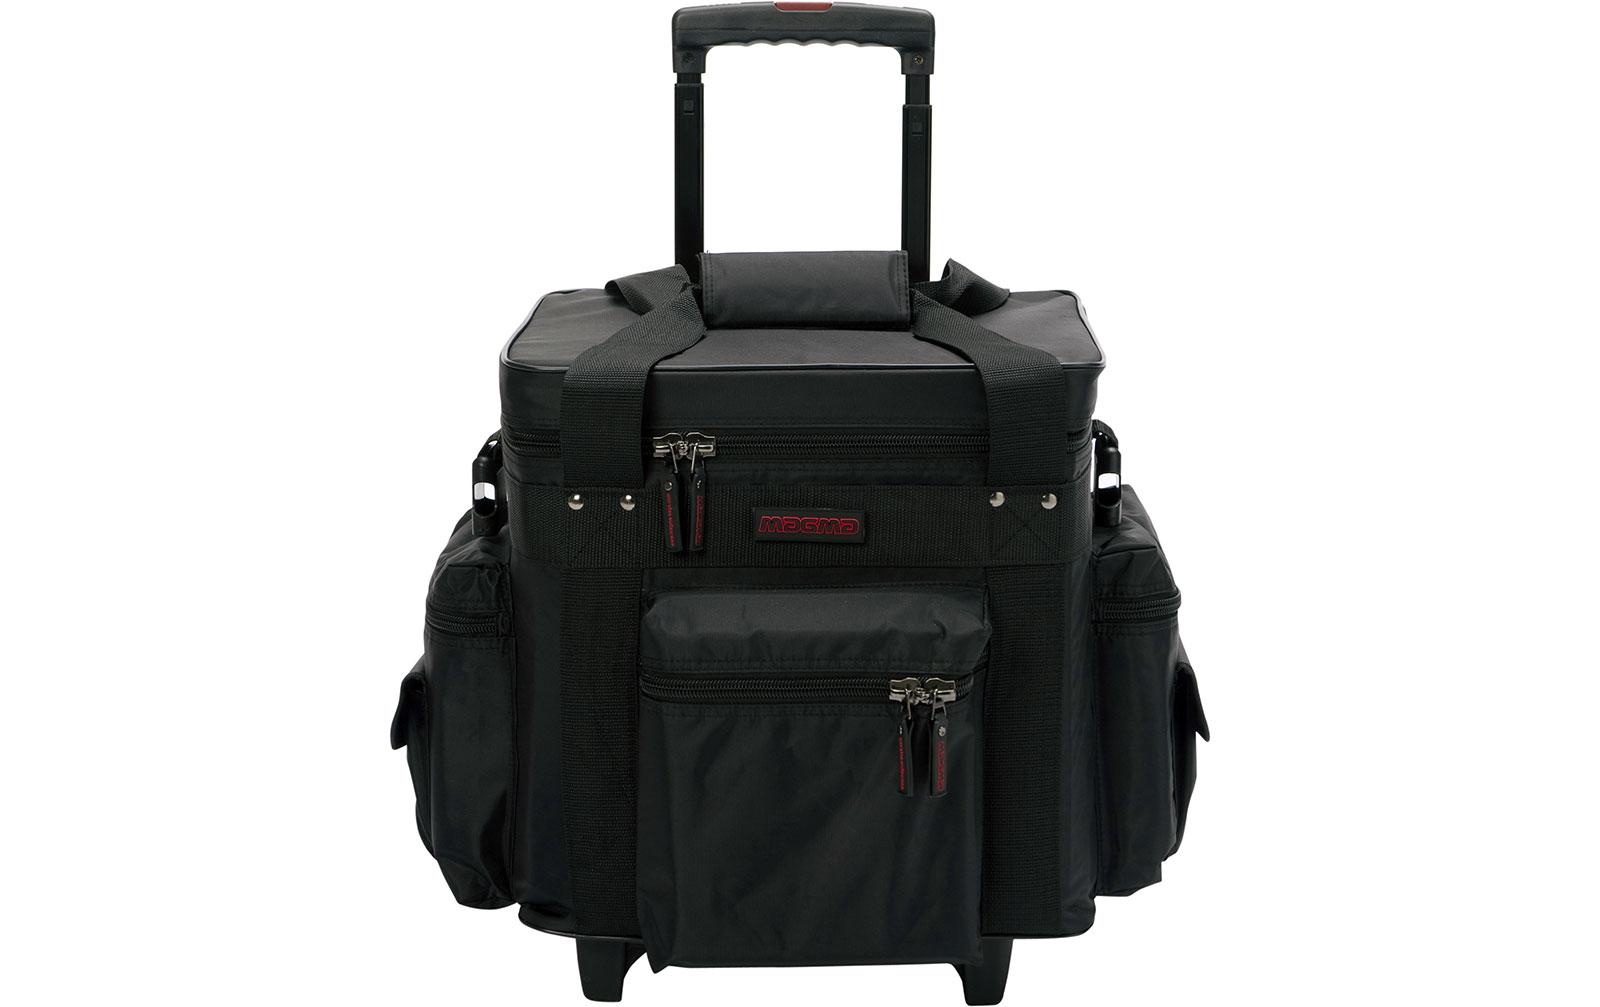 magma-lp-bag-100-trolley-black-black-40500-